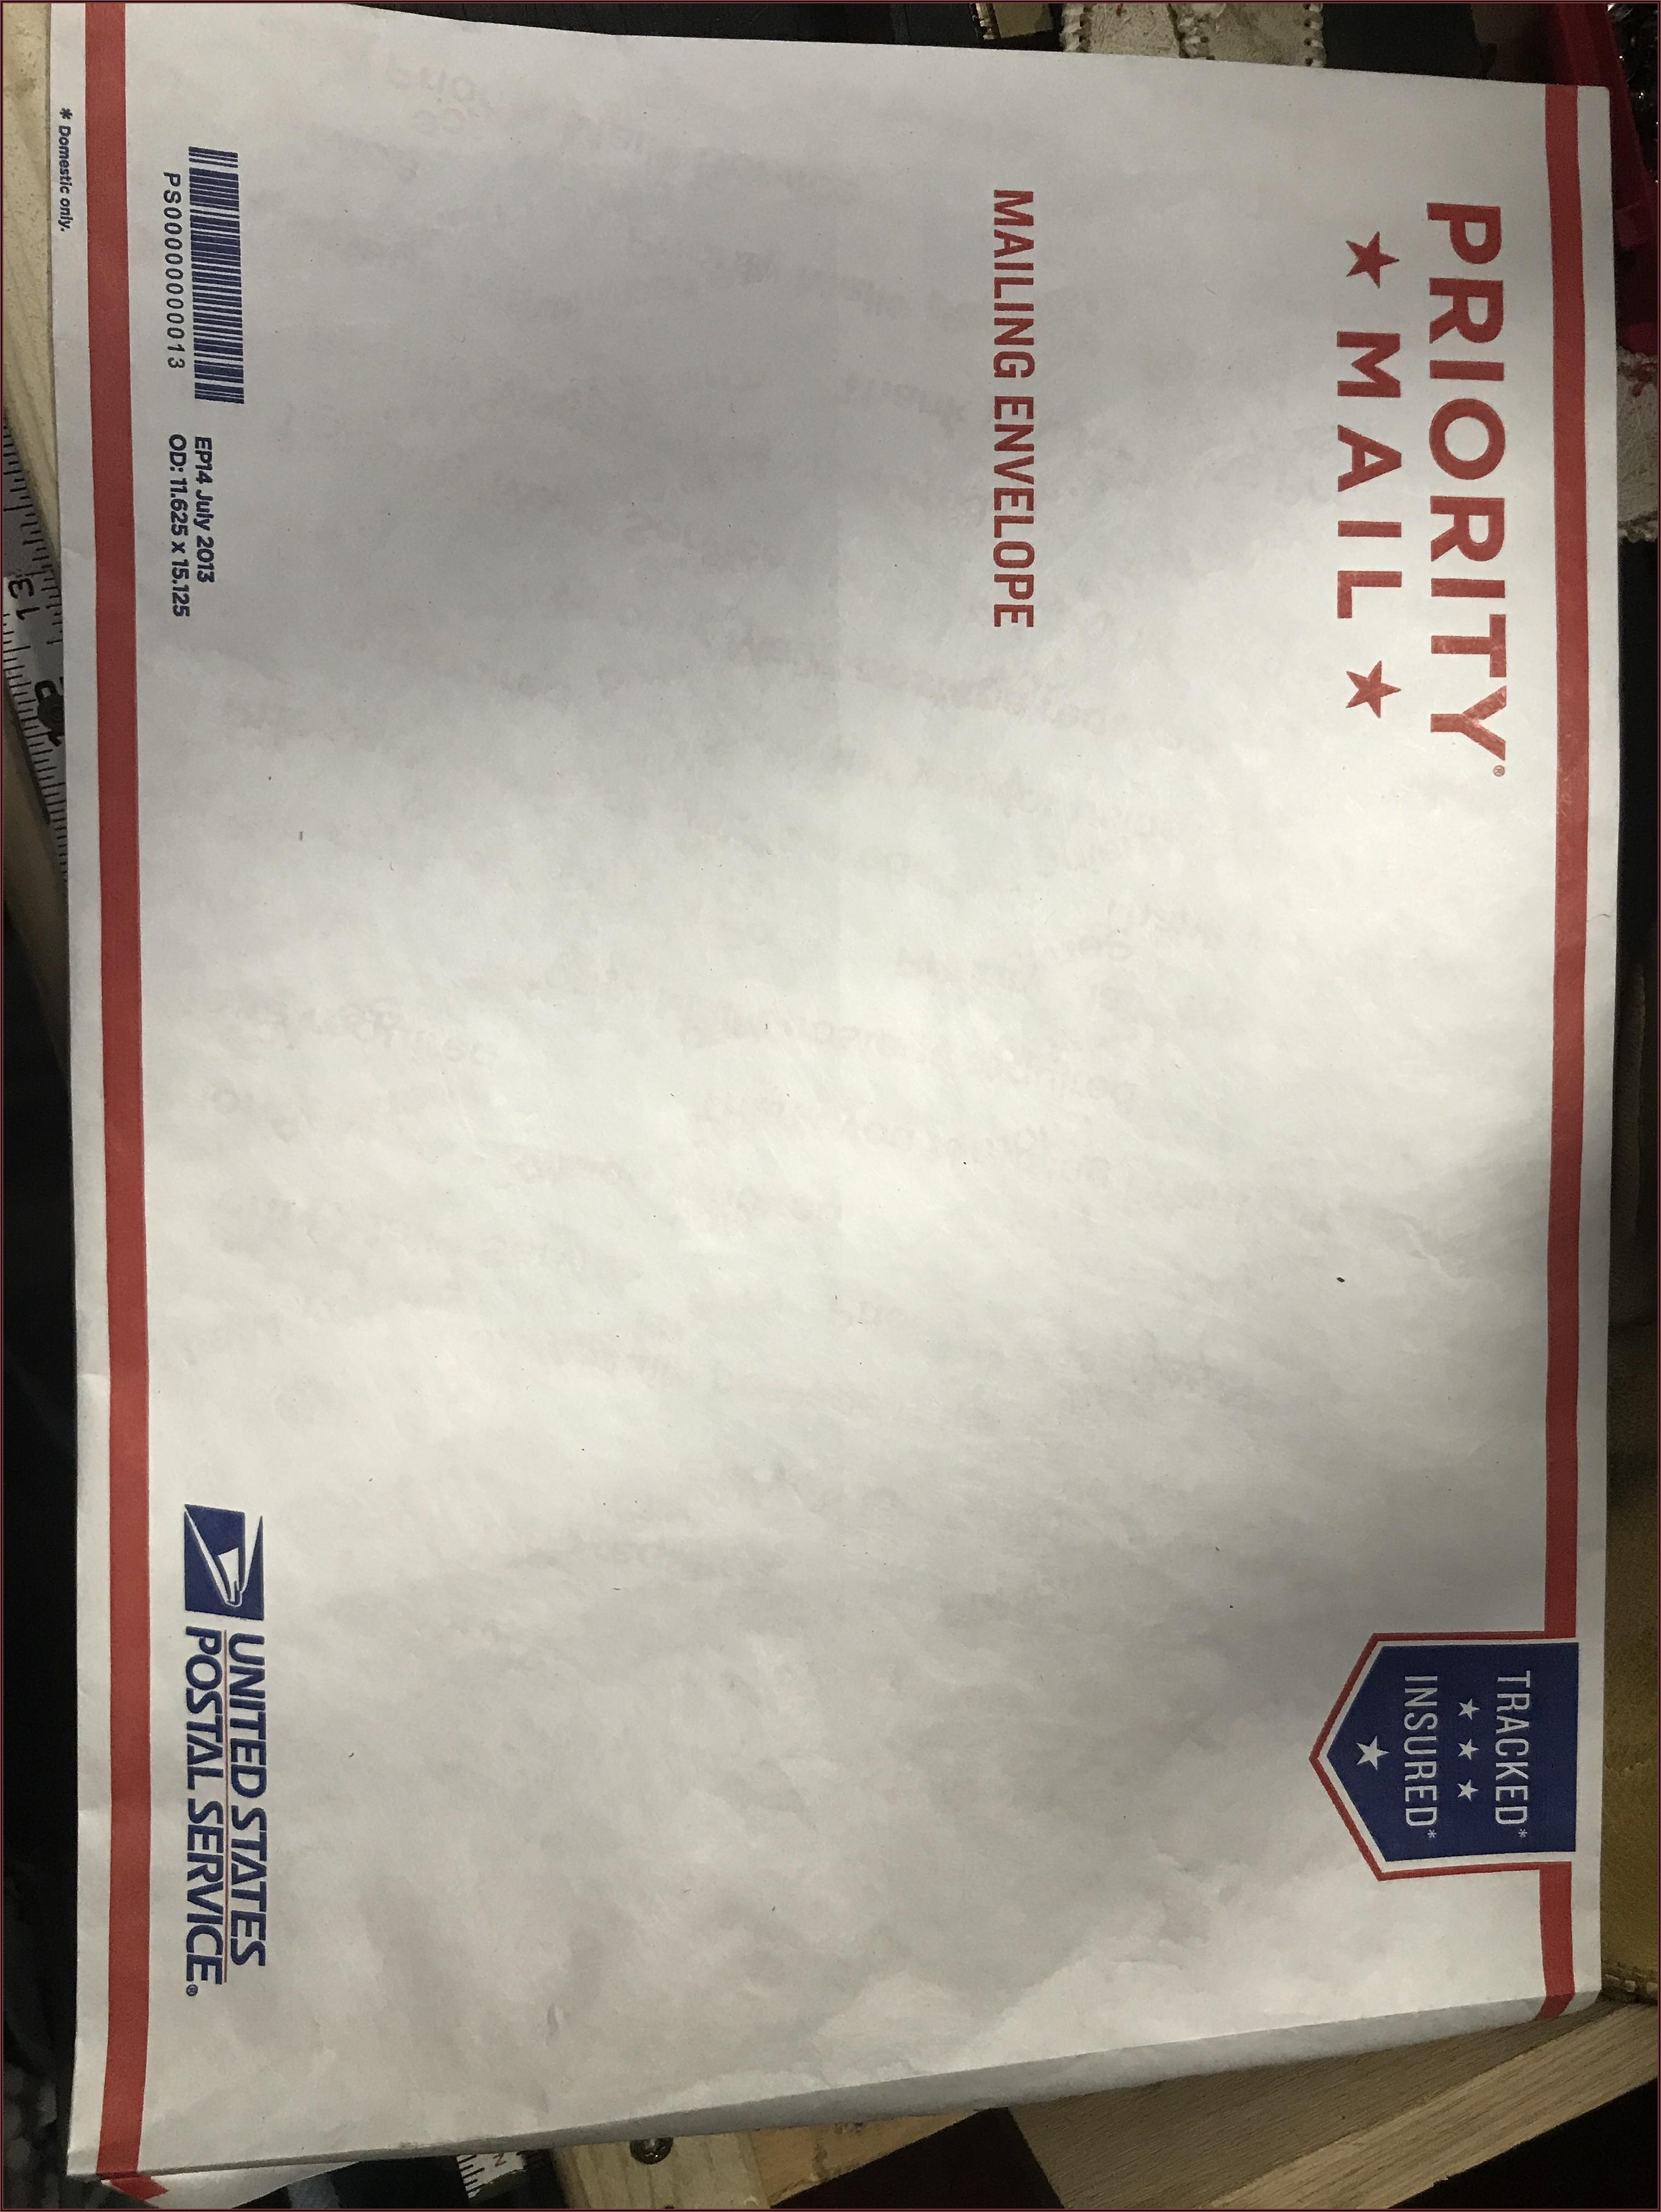 Priority Mail Envelope Postage Rate